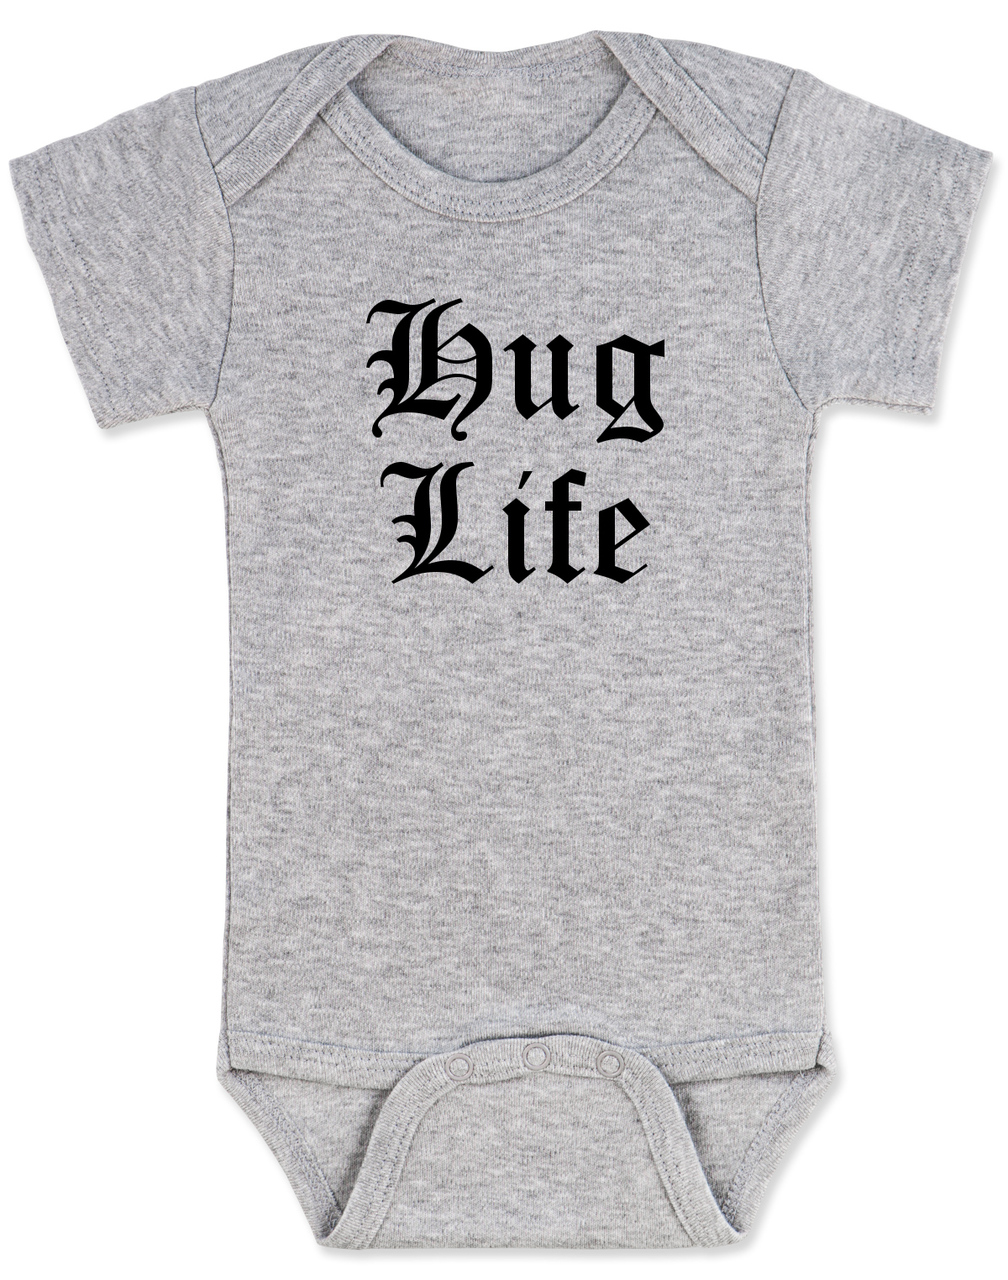 453ad84b2 Hug Life gangsta baby Bodysuit, grey